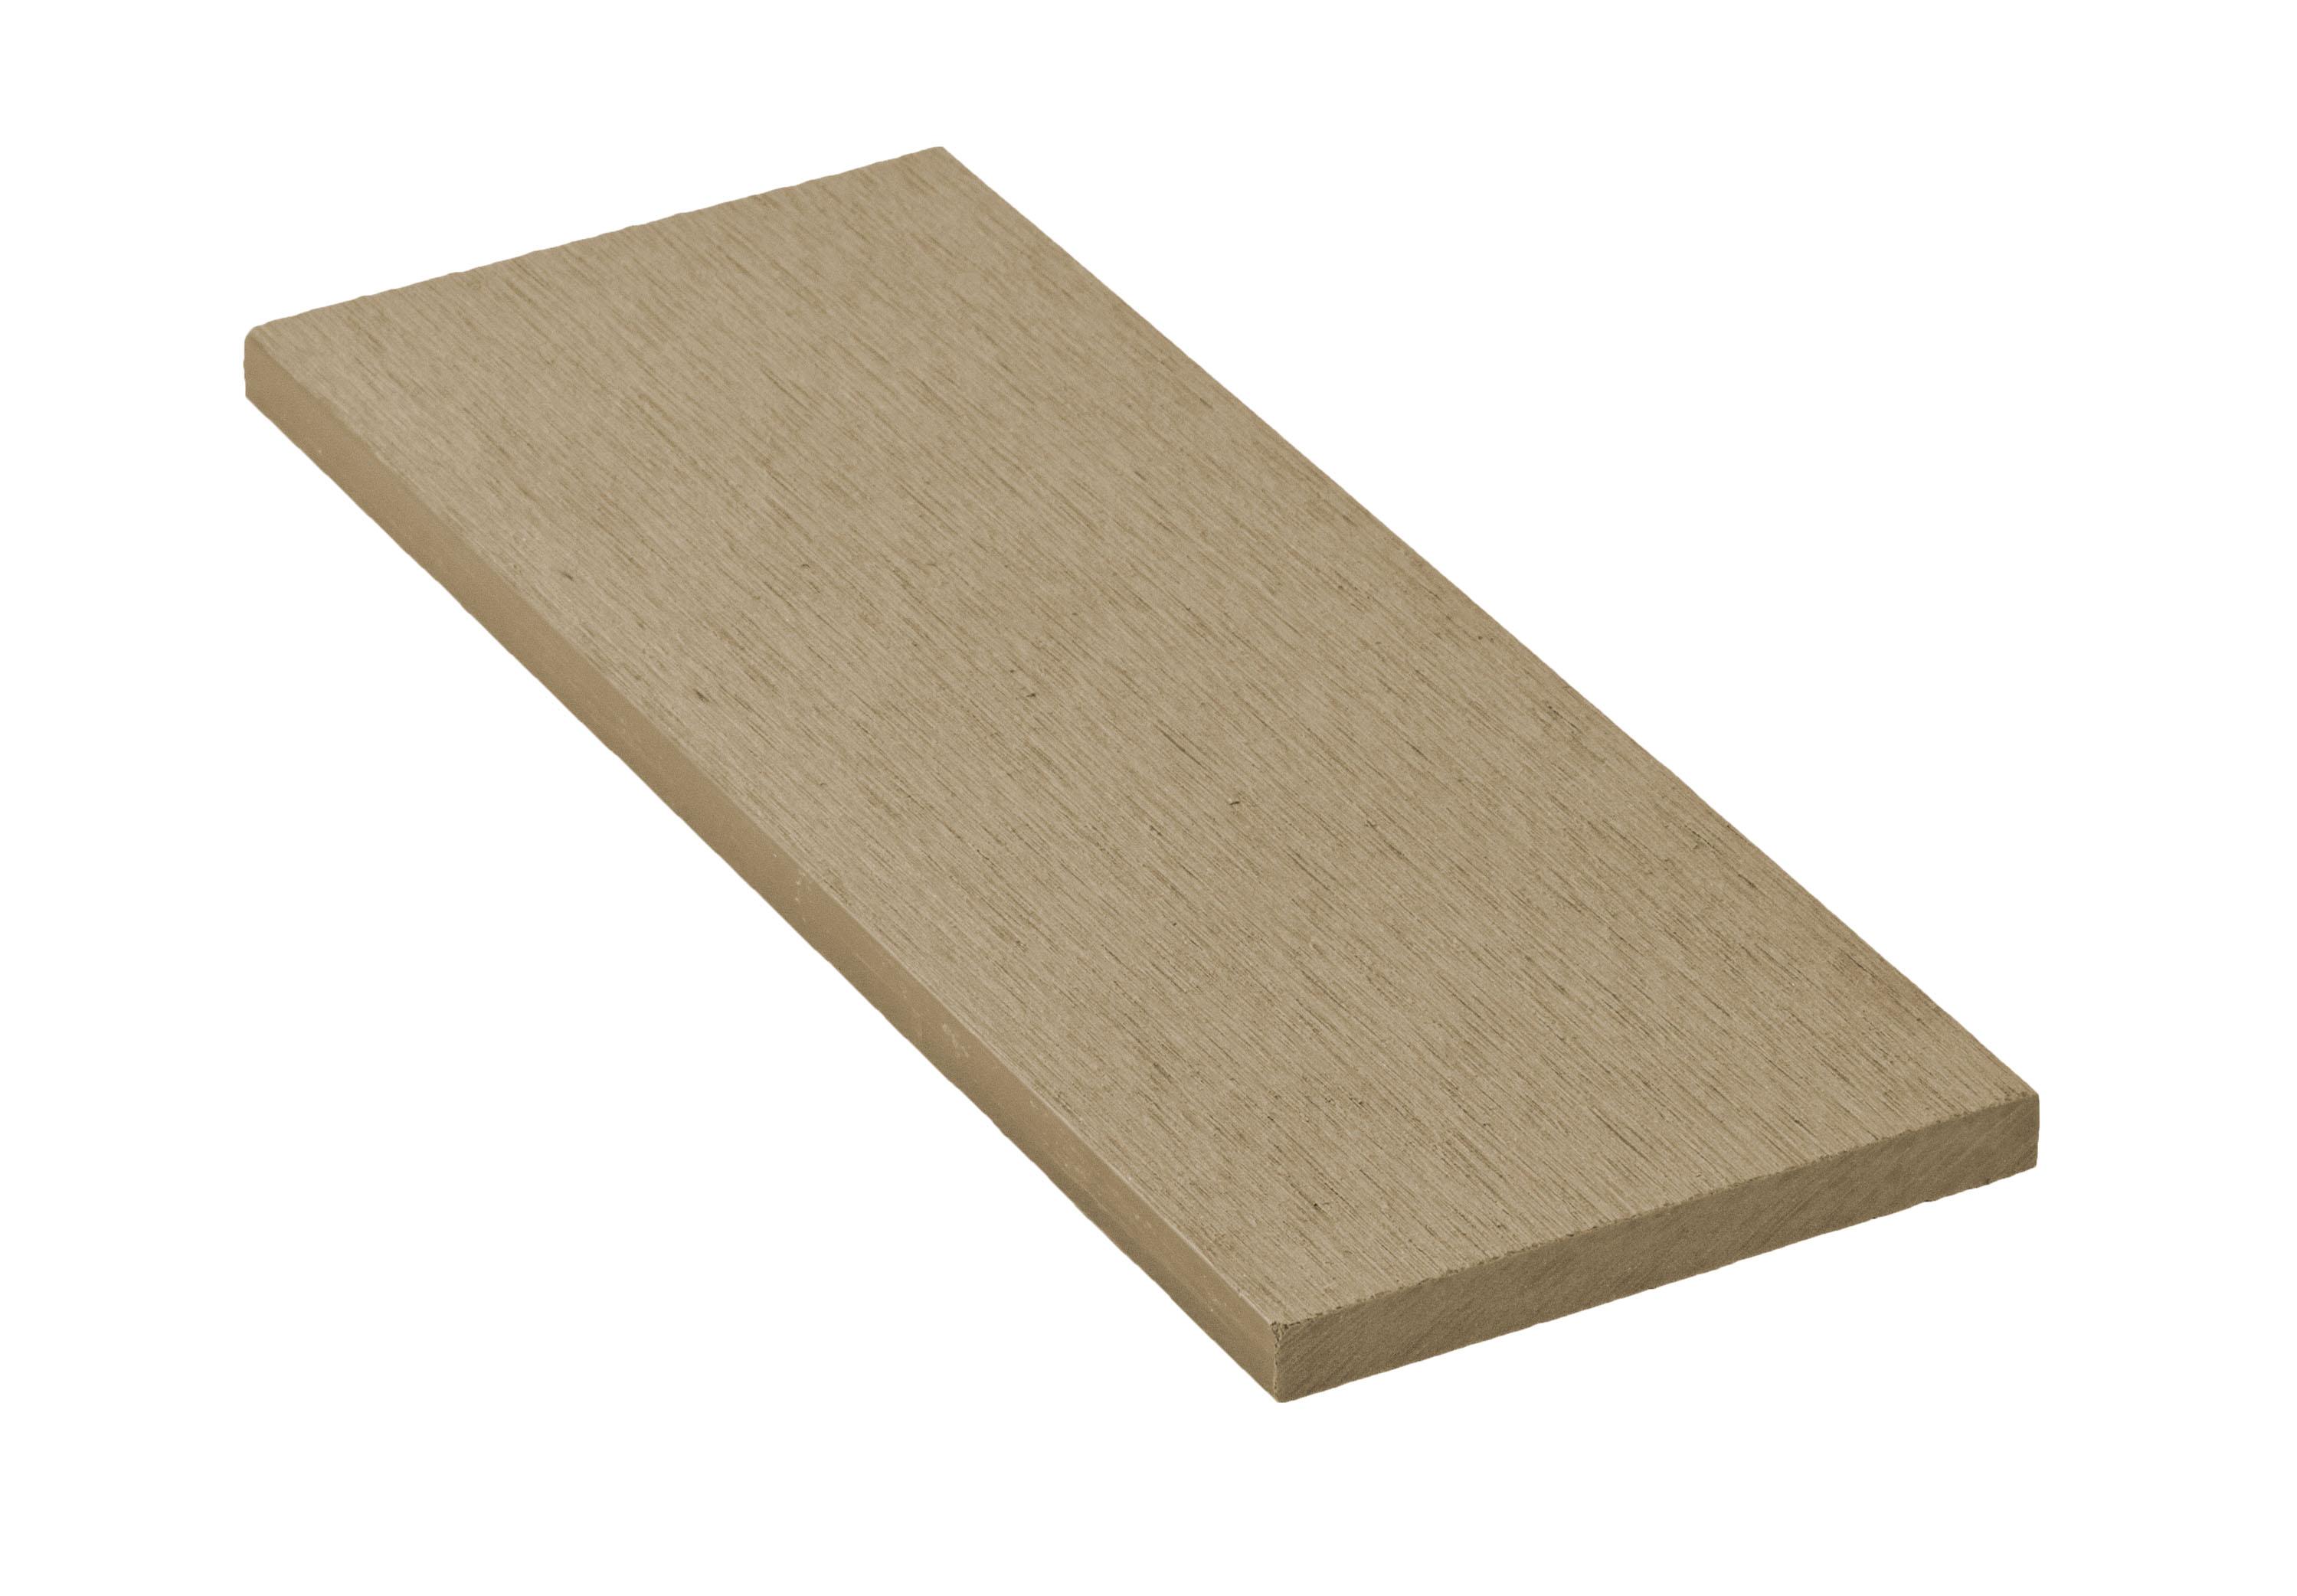 Zakončovácí lišta G21 Cumaru plochá 0,9 x 9 x 200 cm, mat. WPC